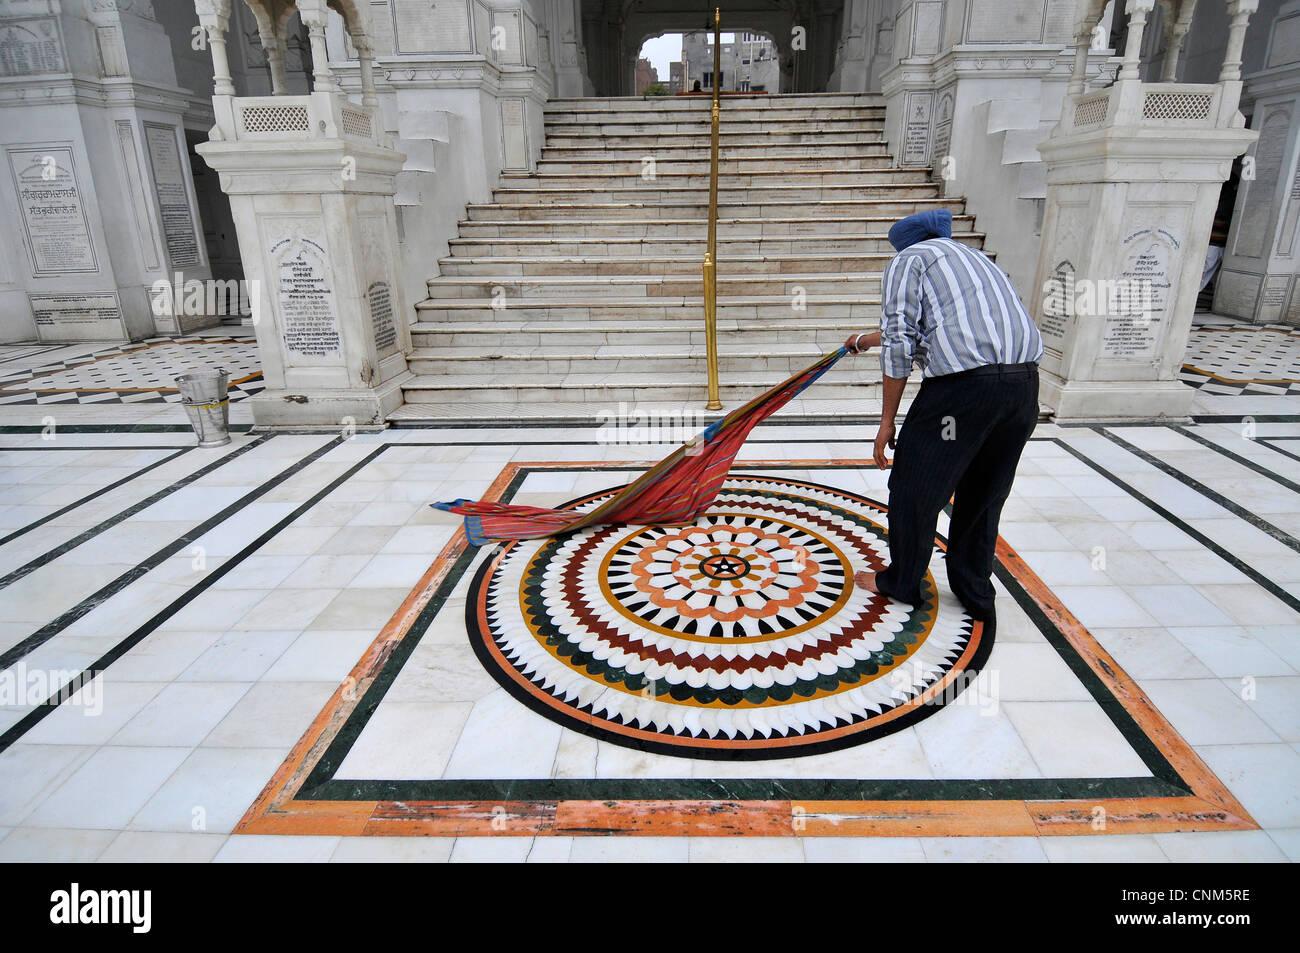 Asie Inde Punjab Amritsar Temple Doré ou Hari Mandir nettoyer les bénévoles en marbre Photo Stock